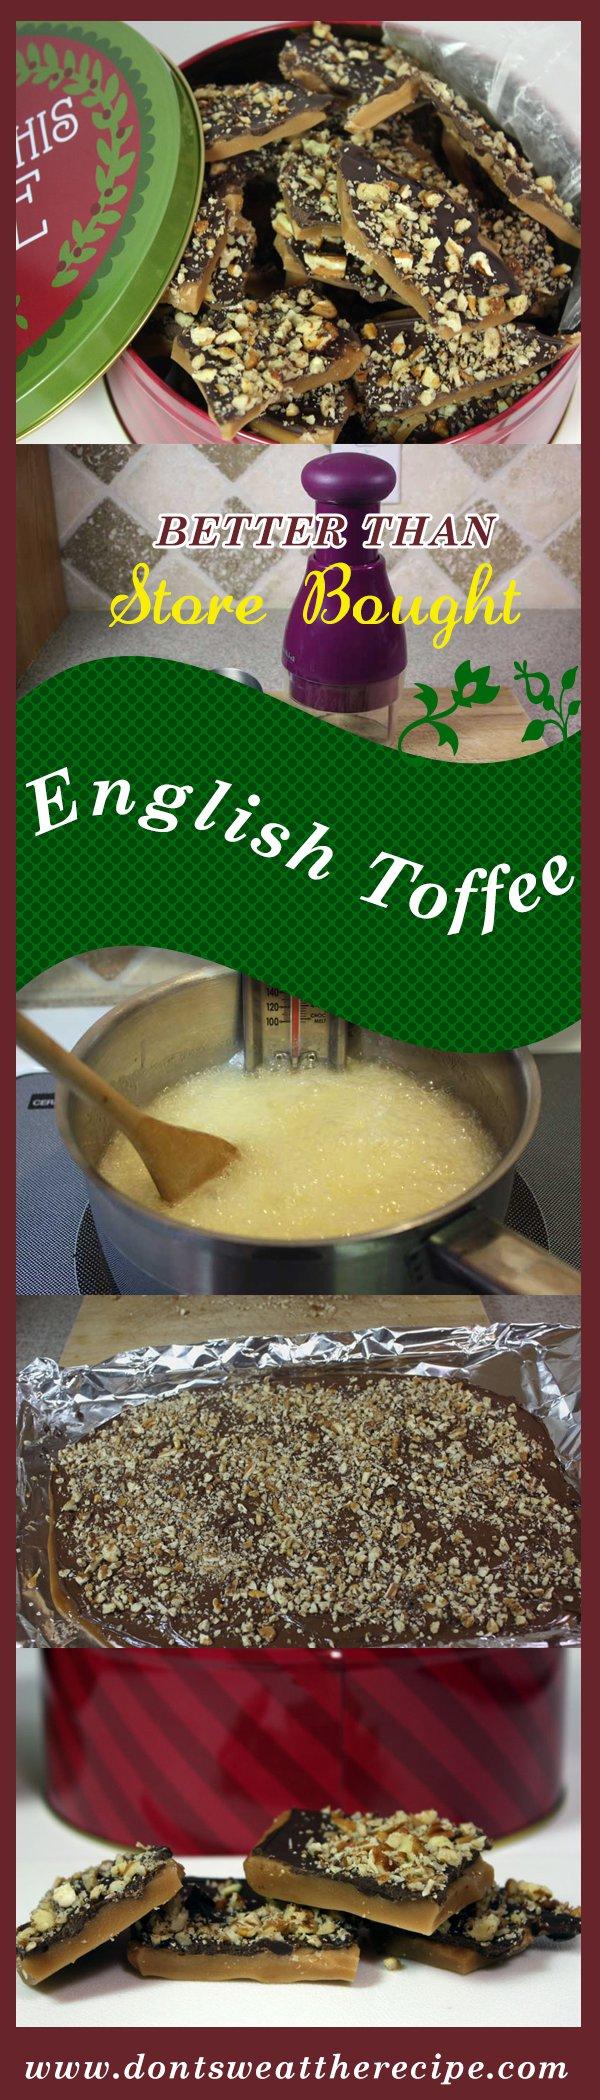 pinterest-toffee1